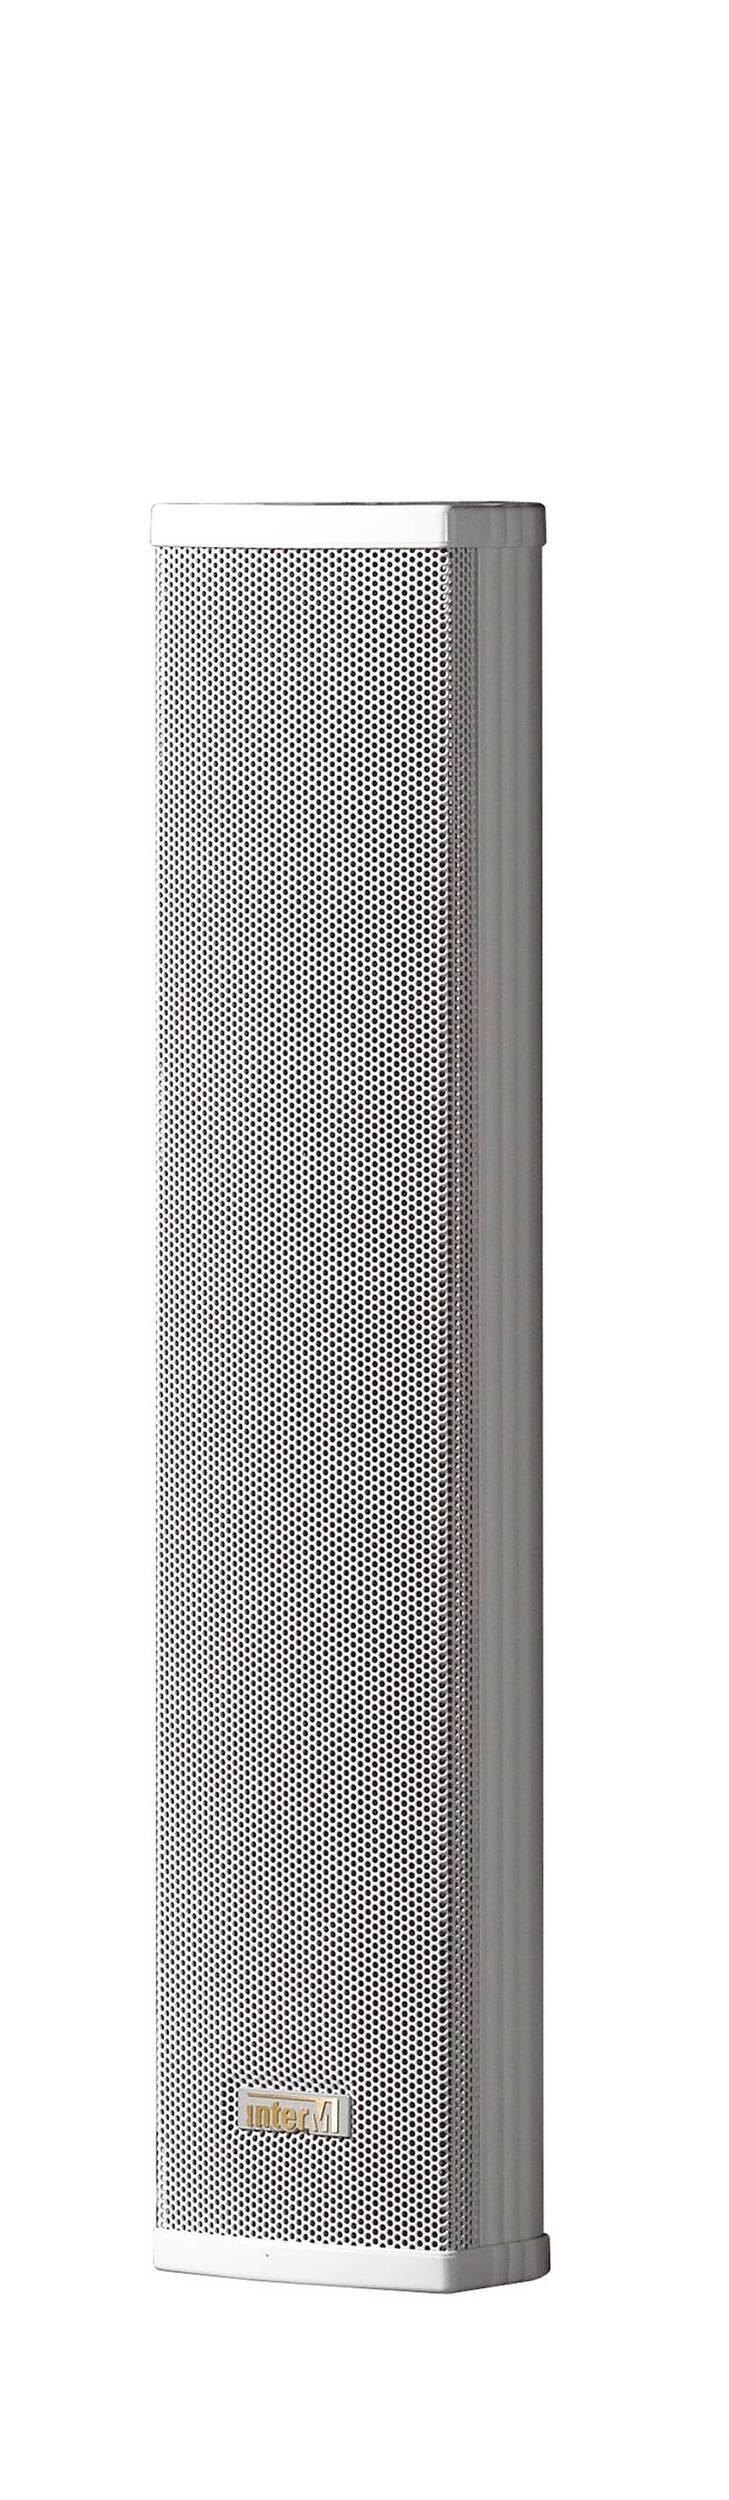 Altavoz en columnas CU-630MV